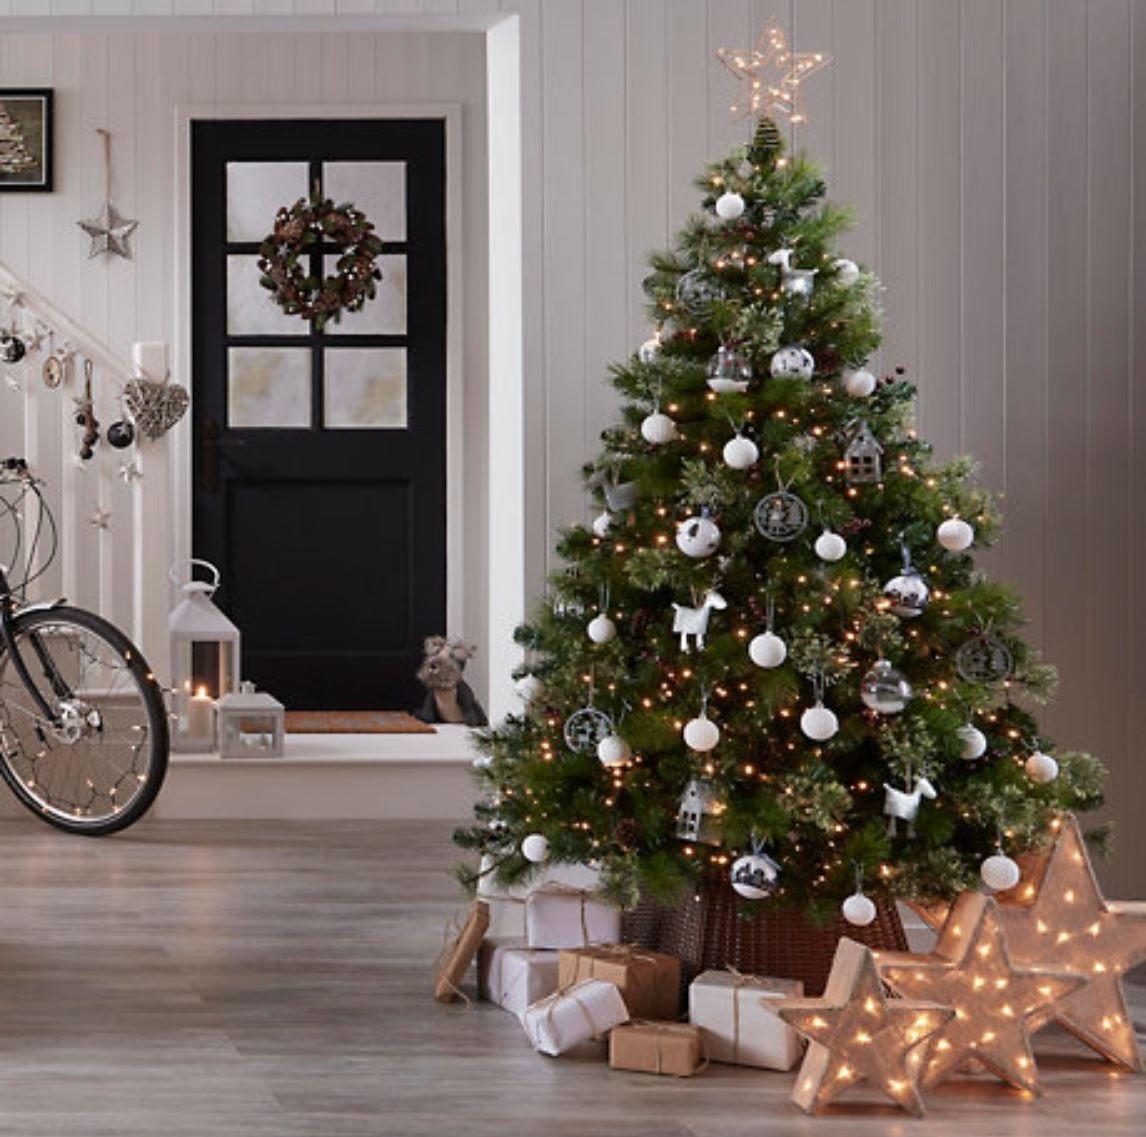 Pin By Niki Parkes On Christmas Trees Christmas Christmas Decorations Holiday Decor